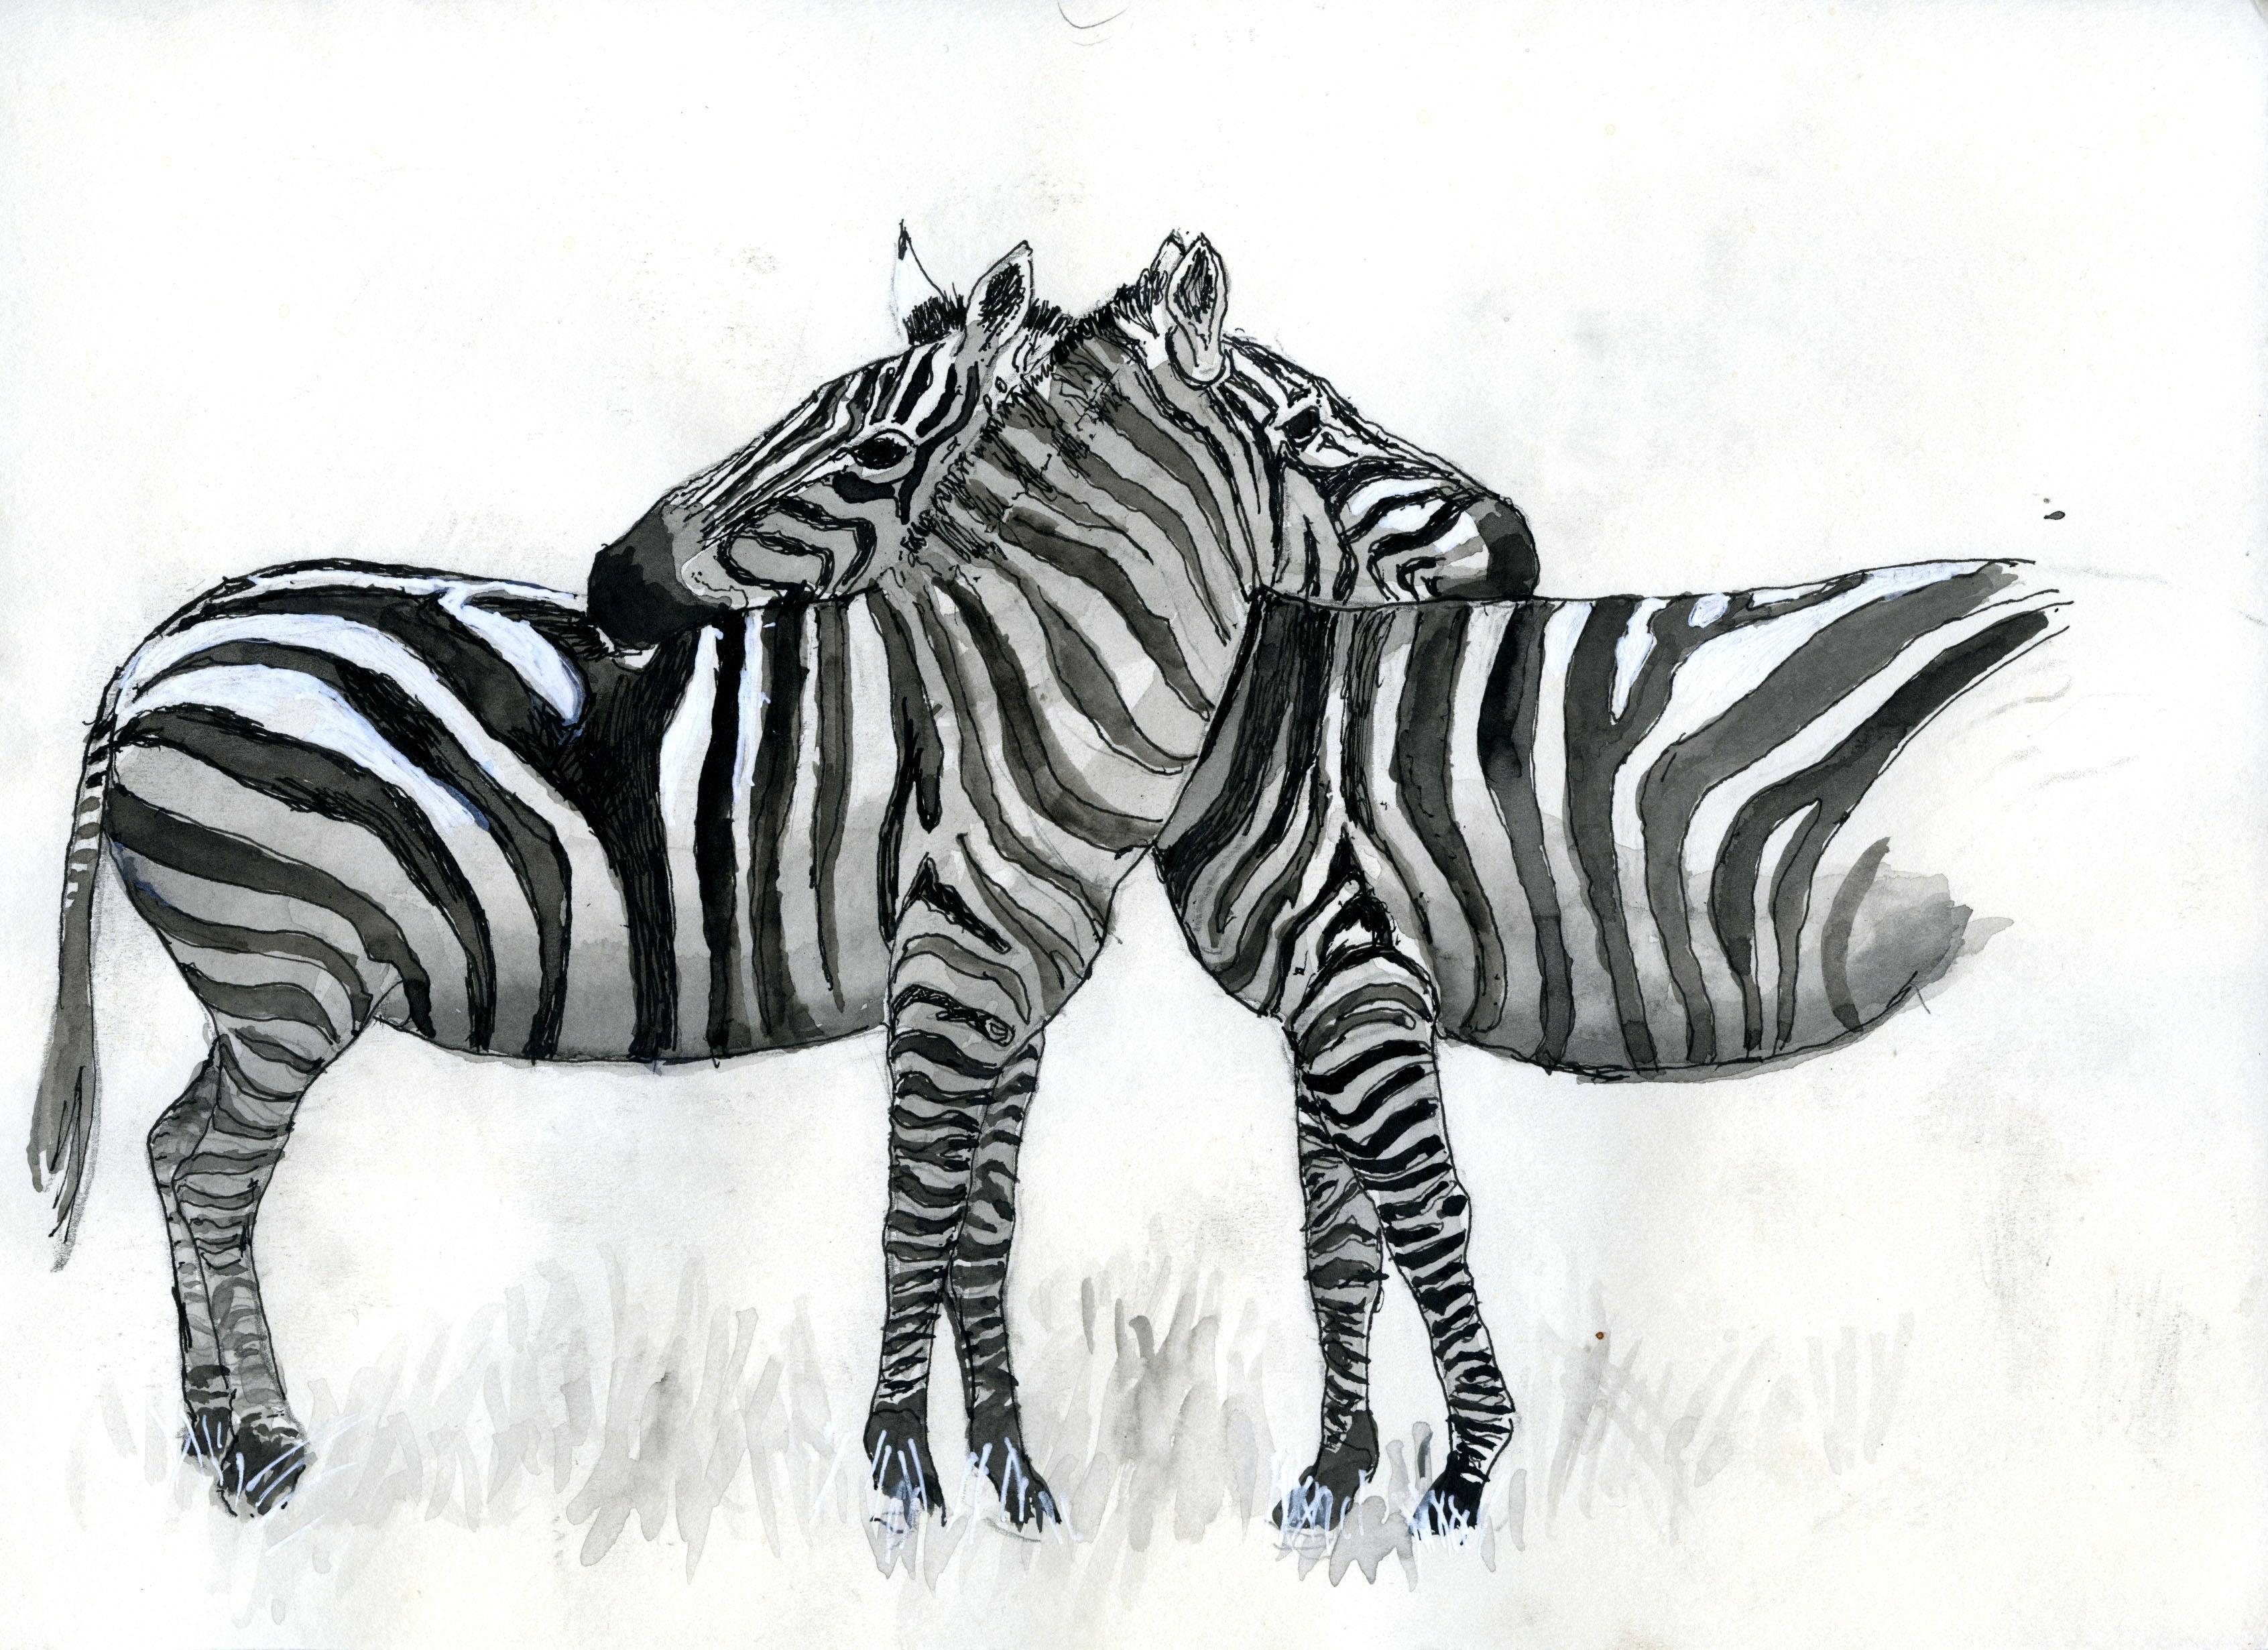 wildlife biologist earns his u0027zebra stripes u0027 with new book uc davis